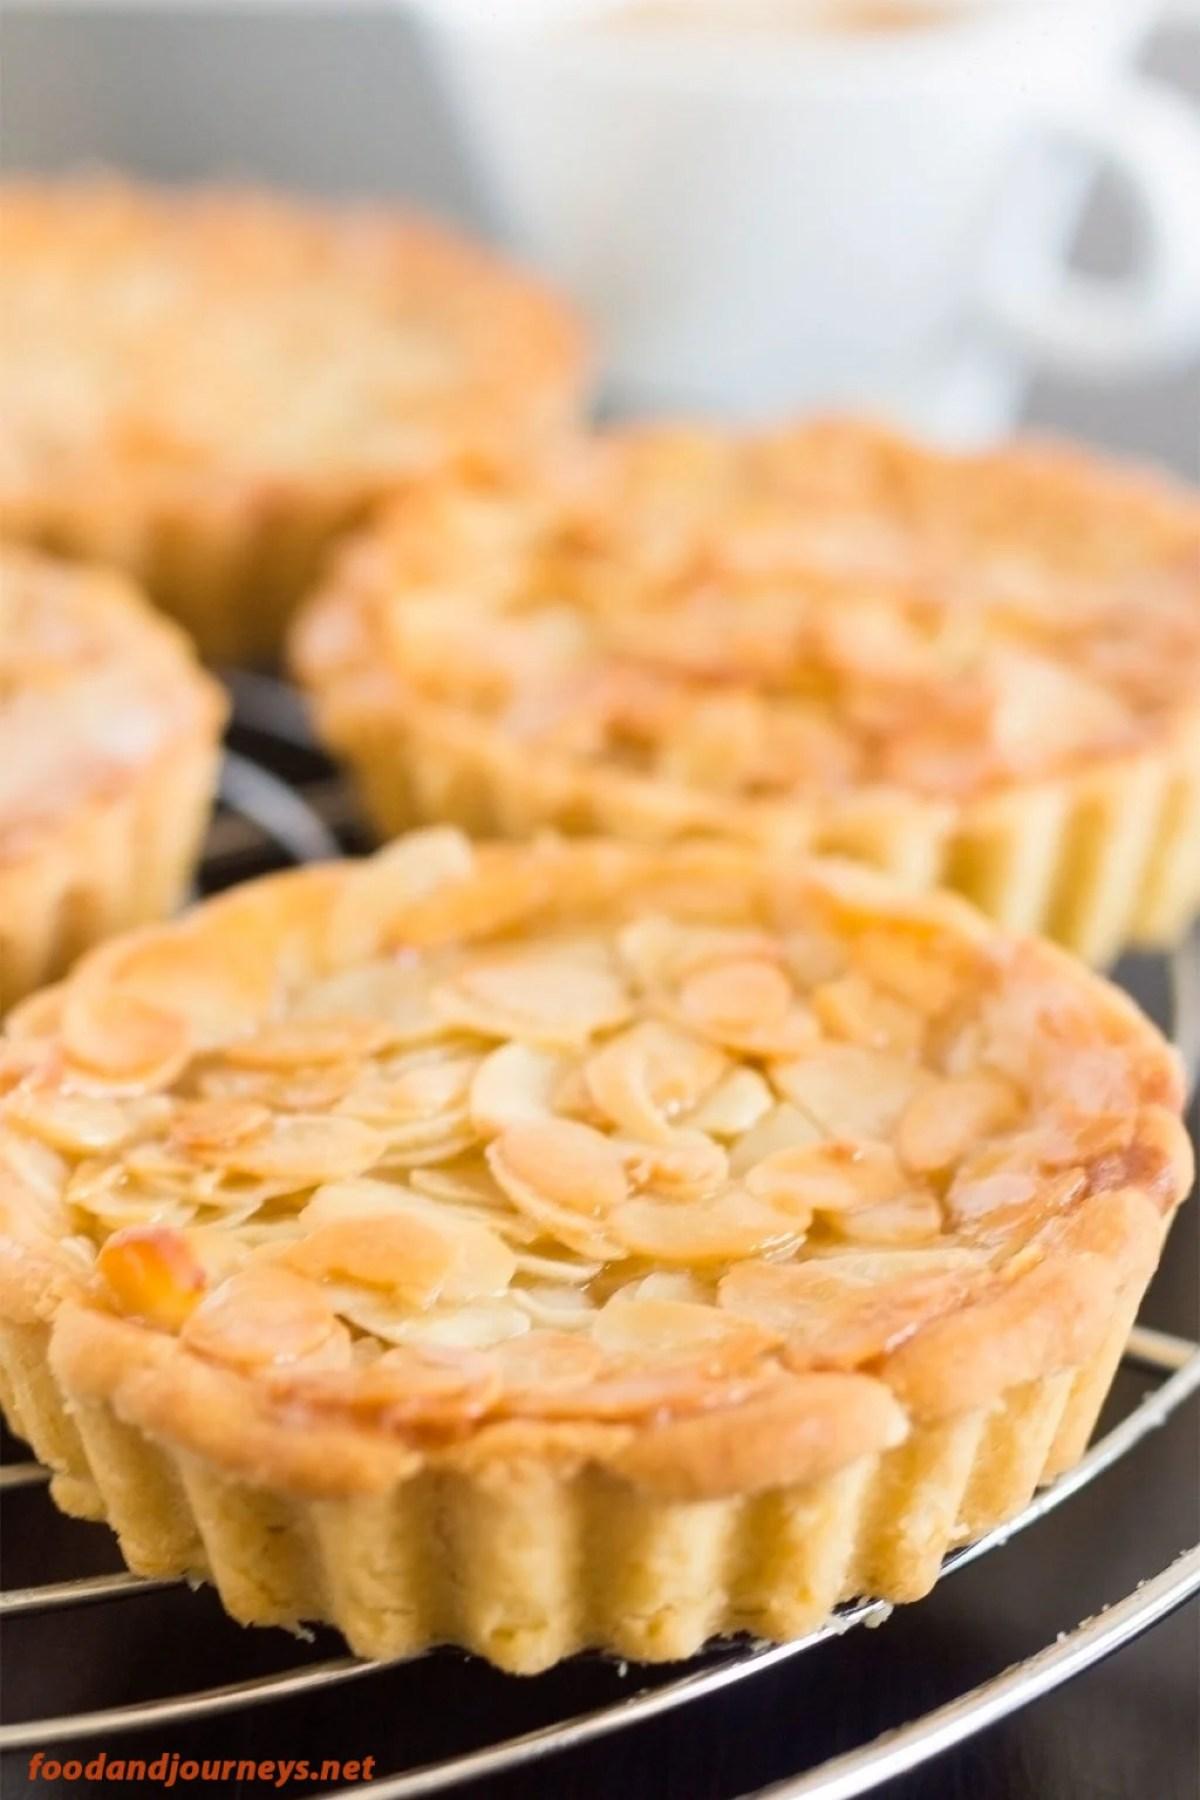 Swedish Almond Tart pic1|foodandjourneys.net